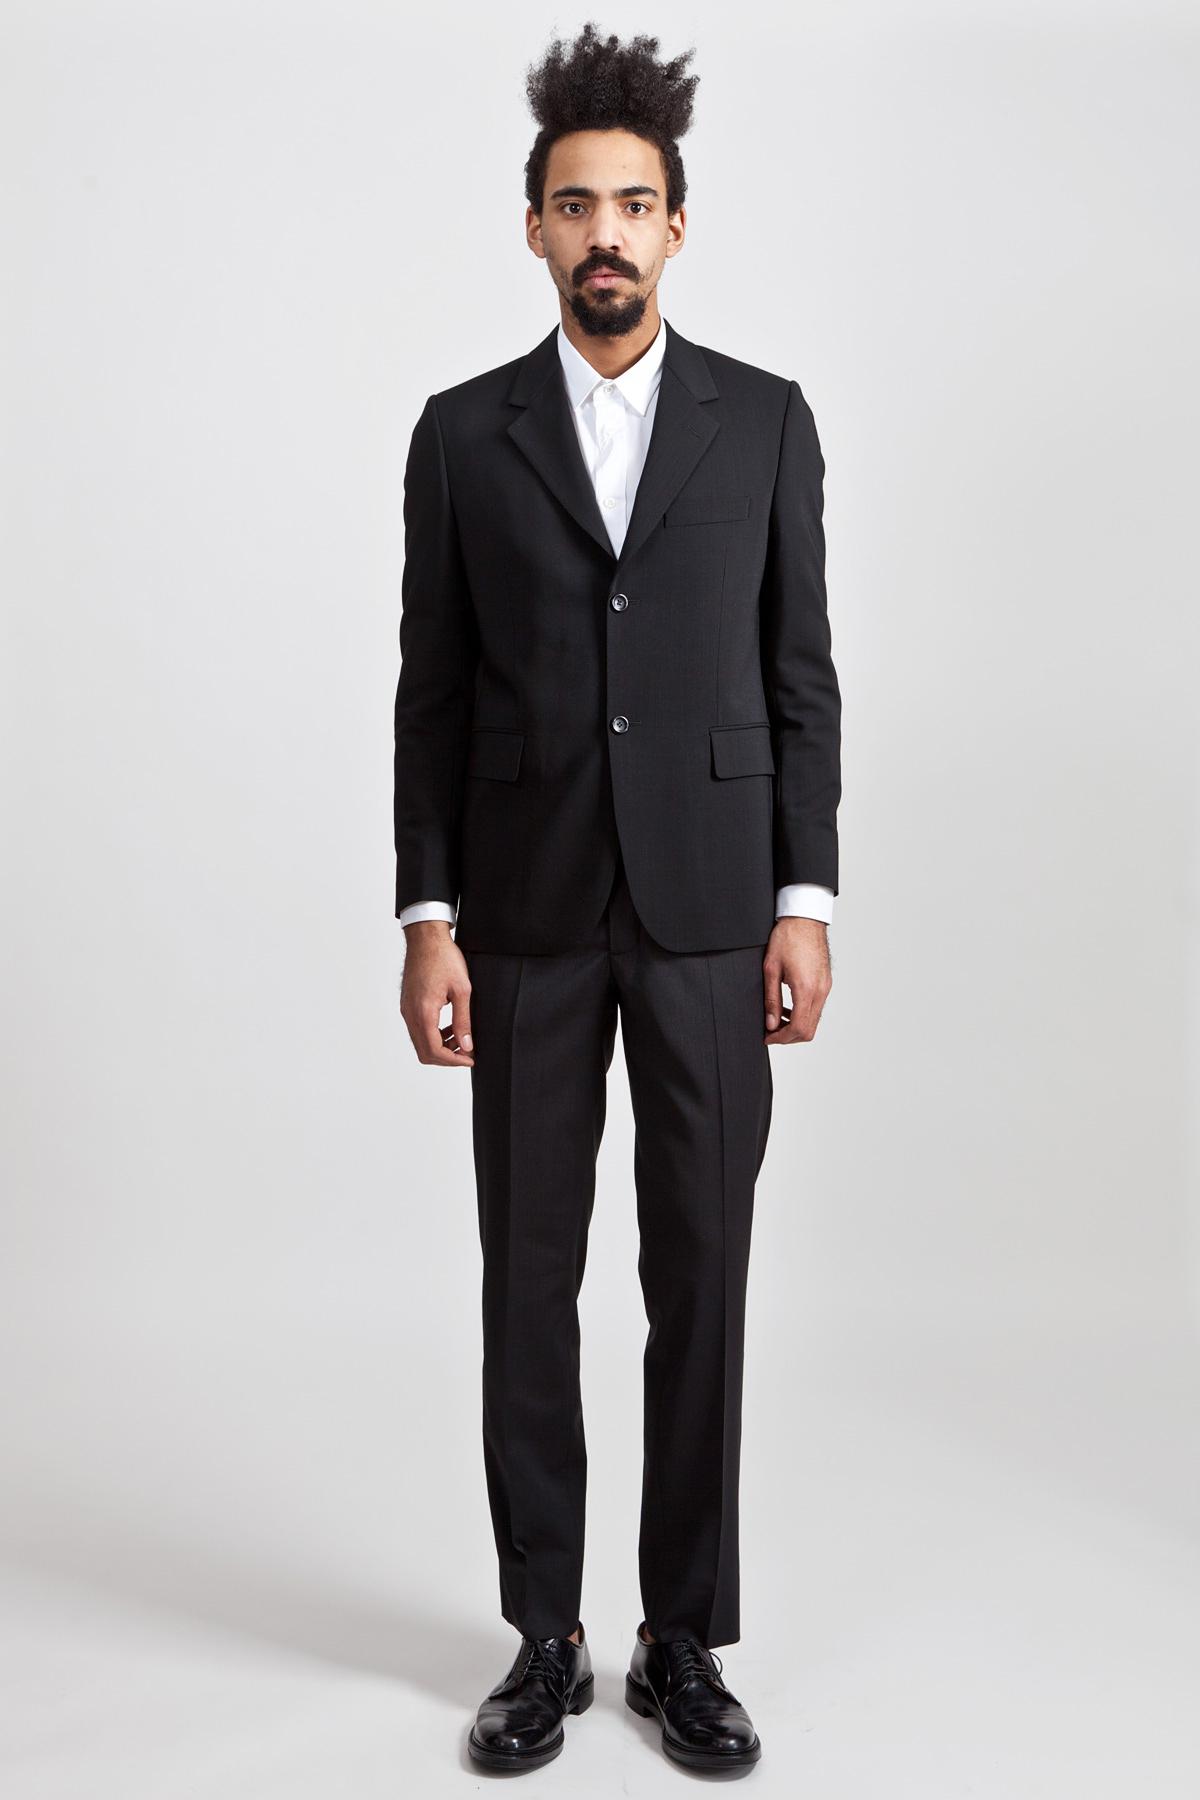 ol-suit-blazer-black001